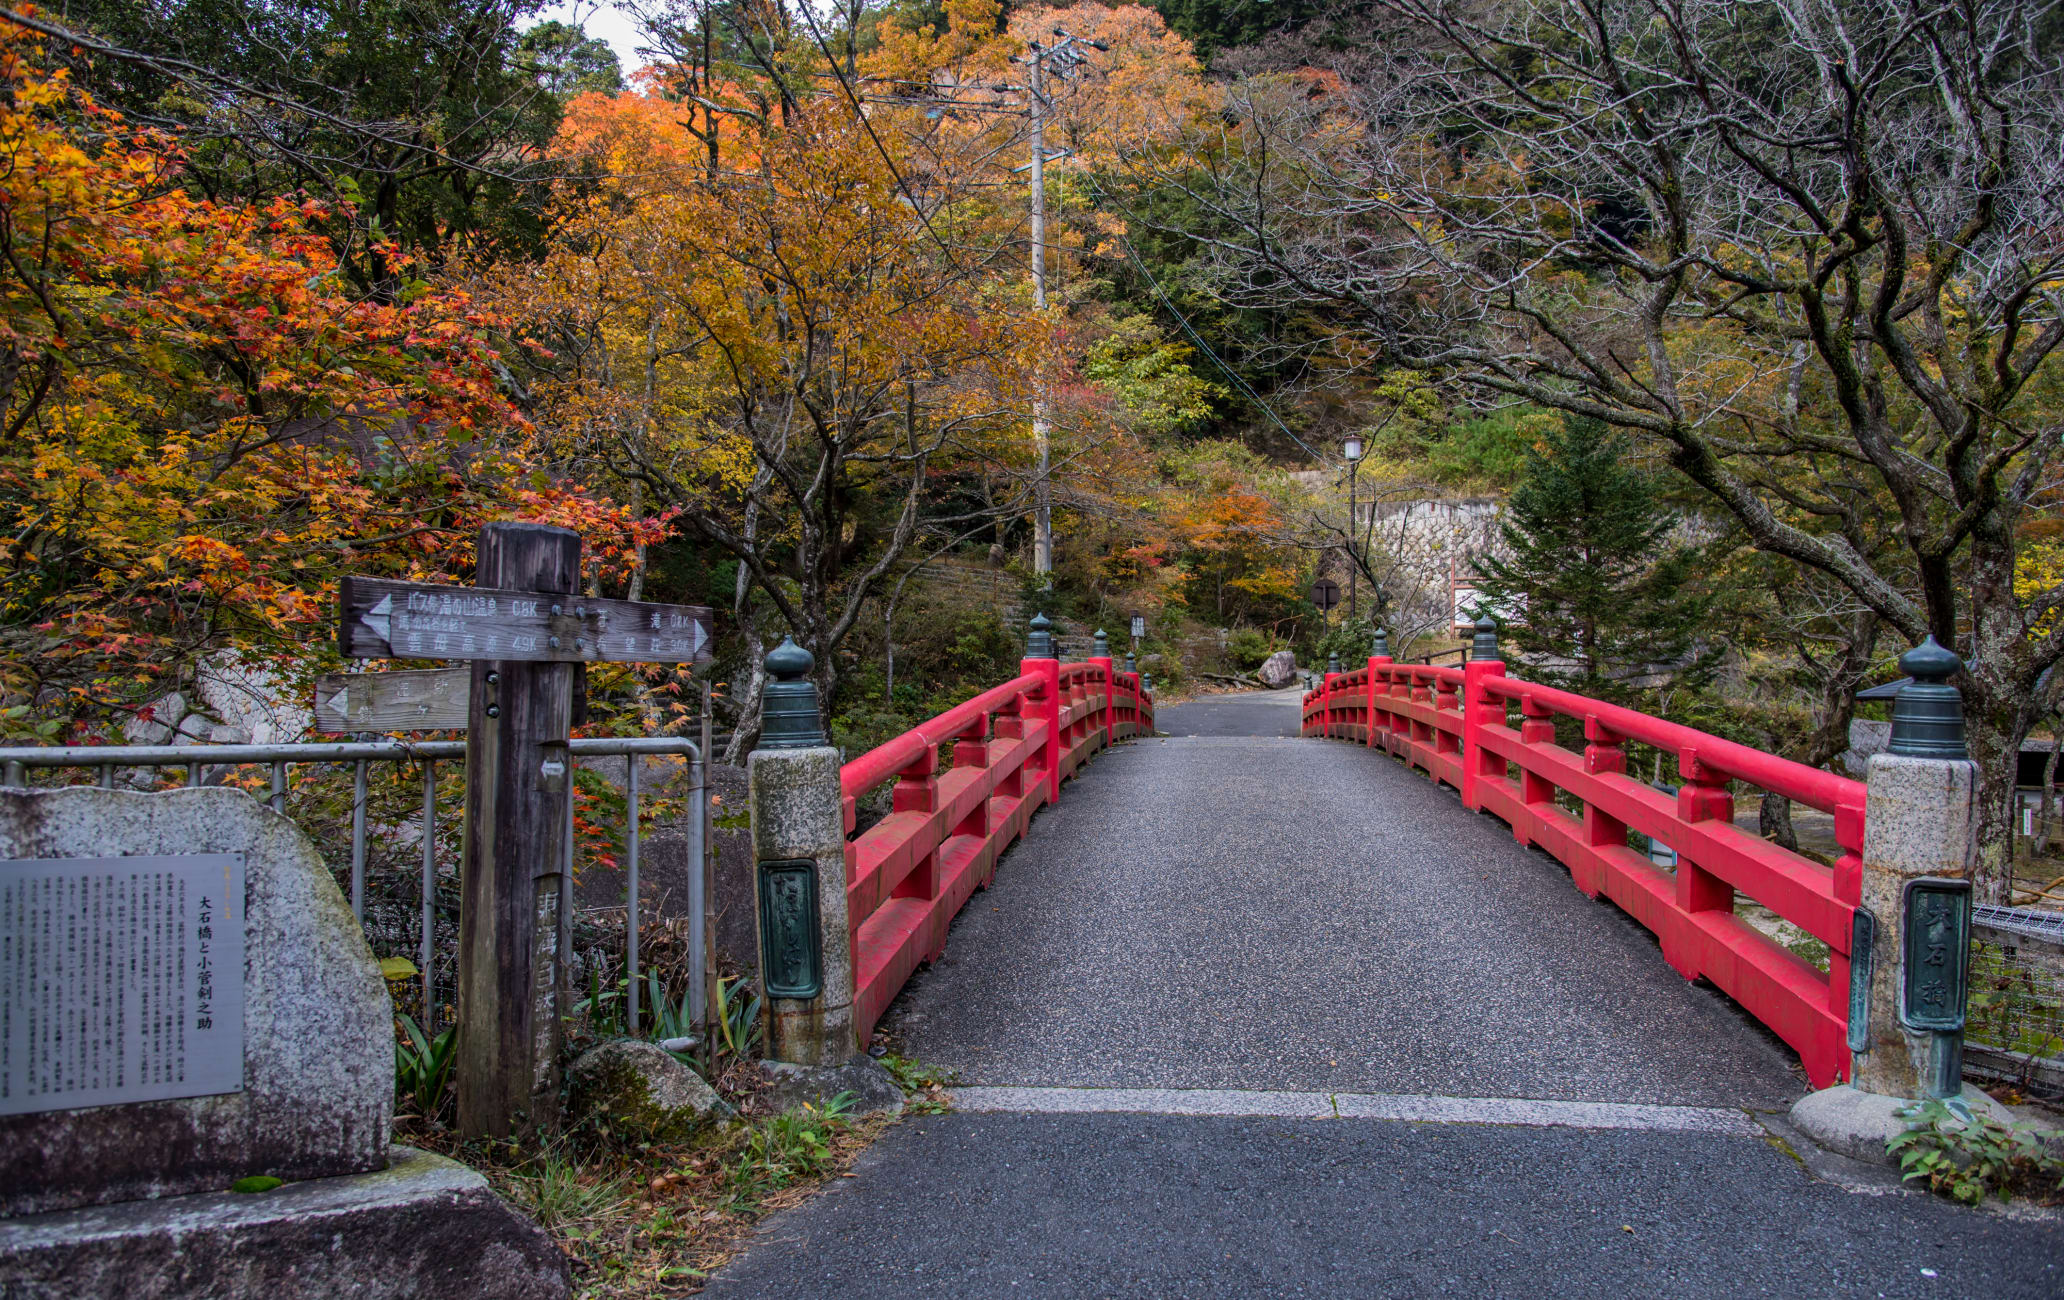 yunoyama-onsen hot spring